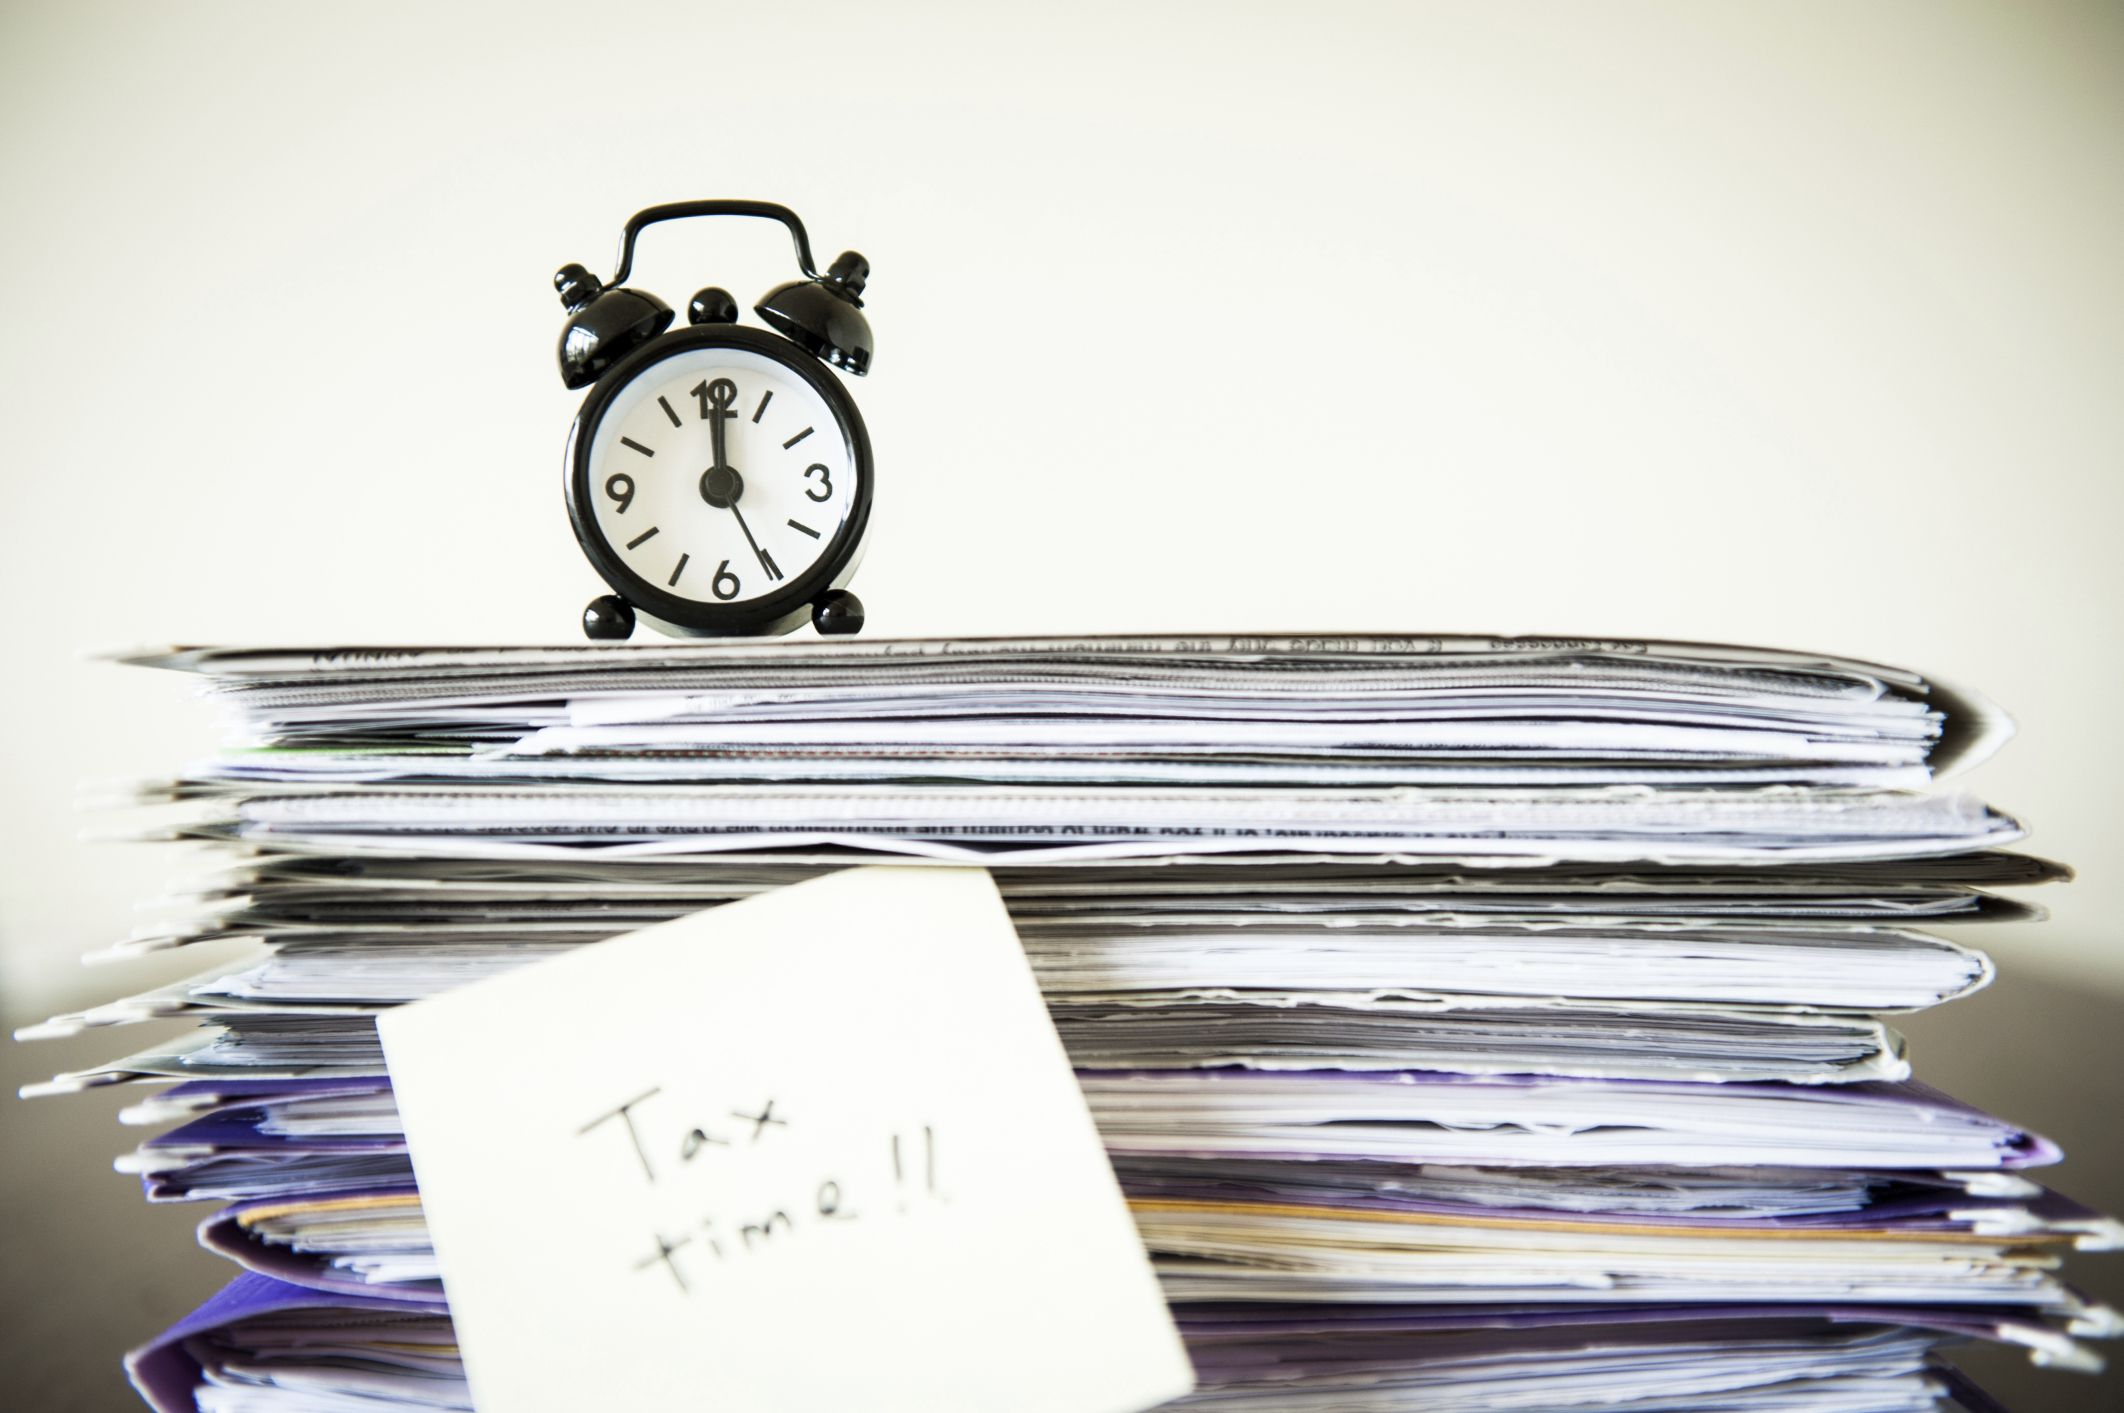 llc tax return form 1065 instructions